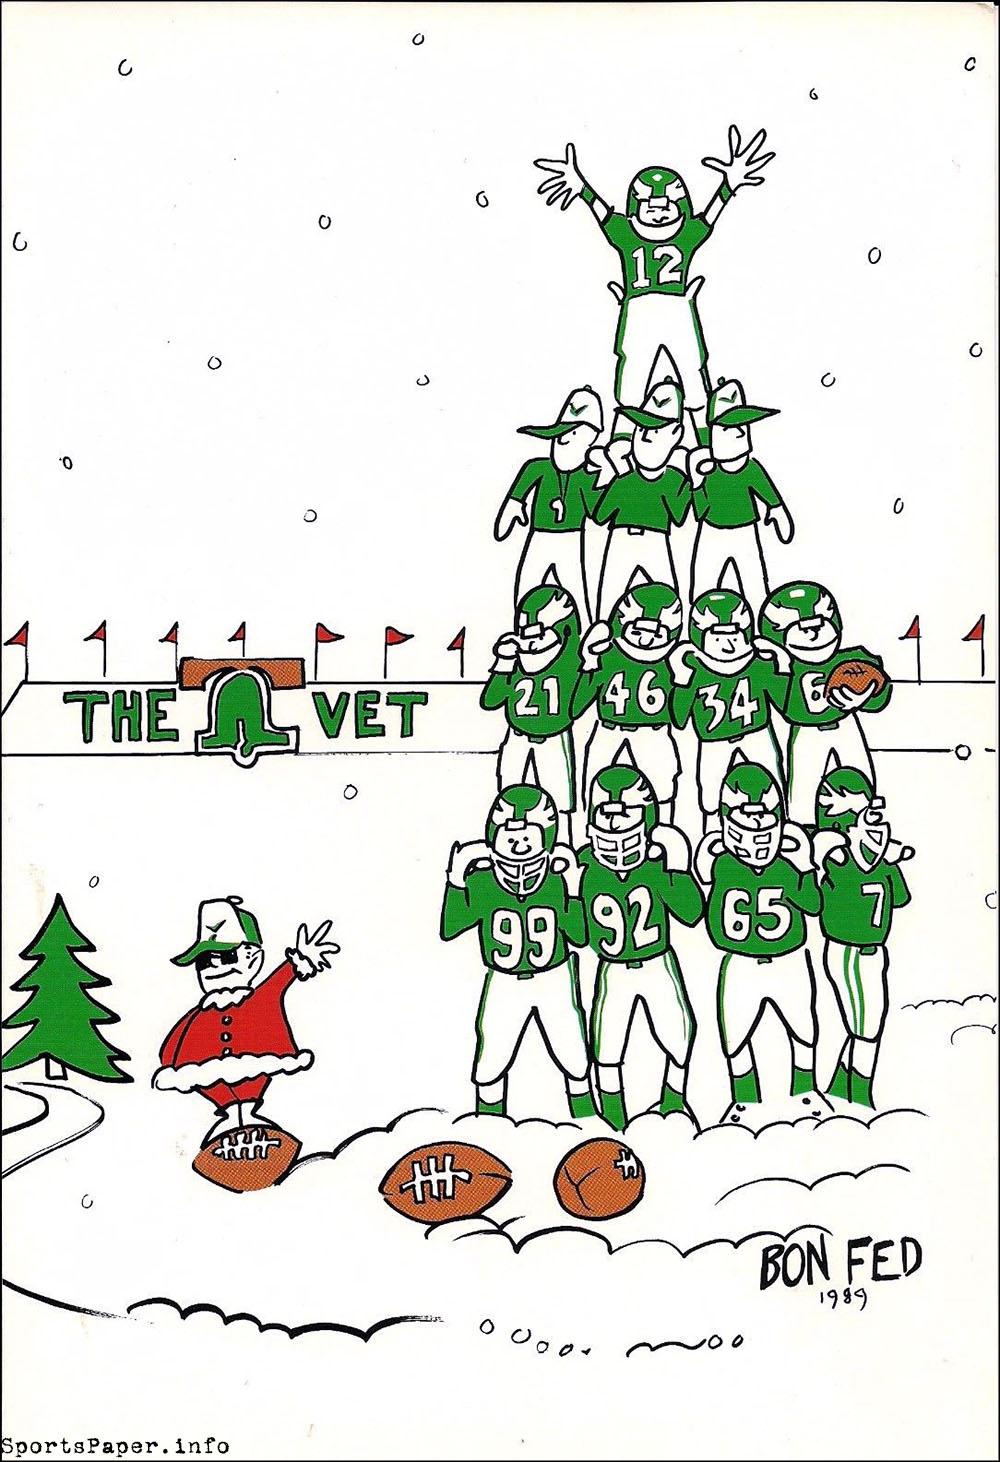 Philadelphia Eagles, 1989